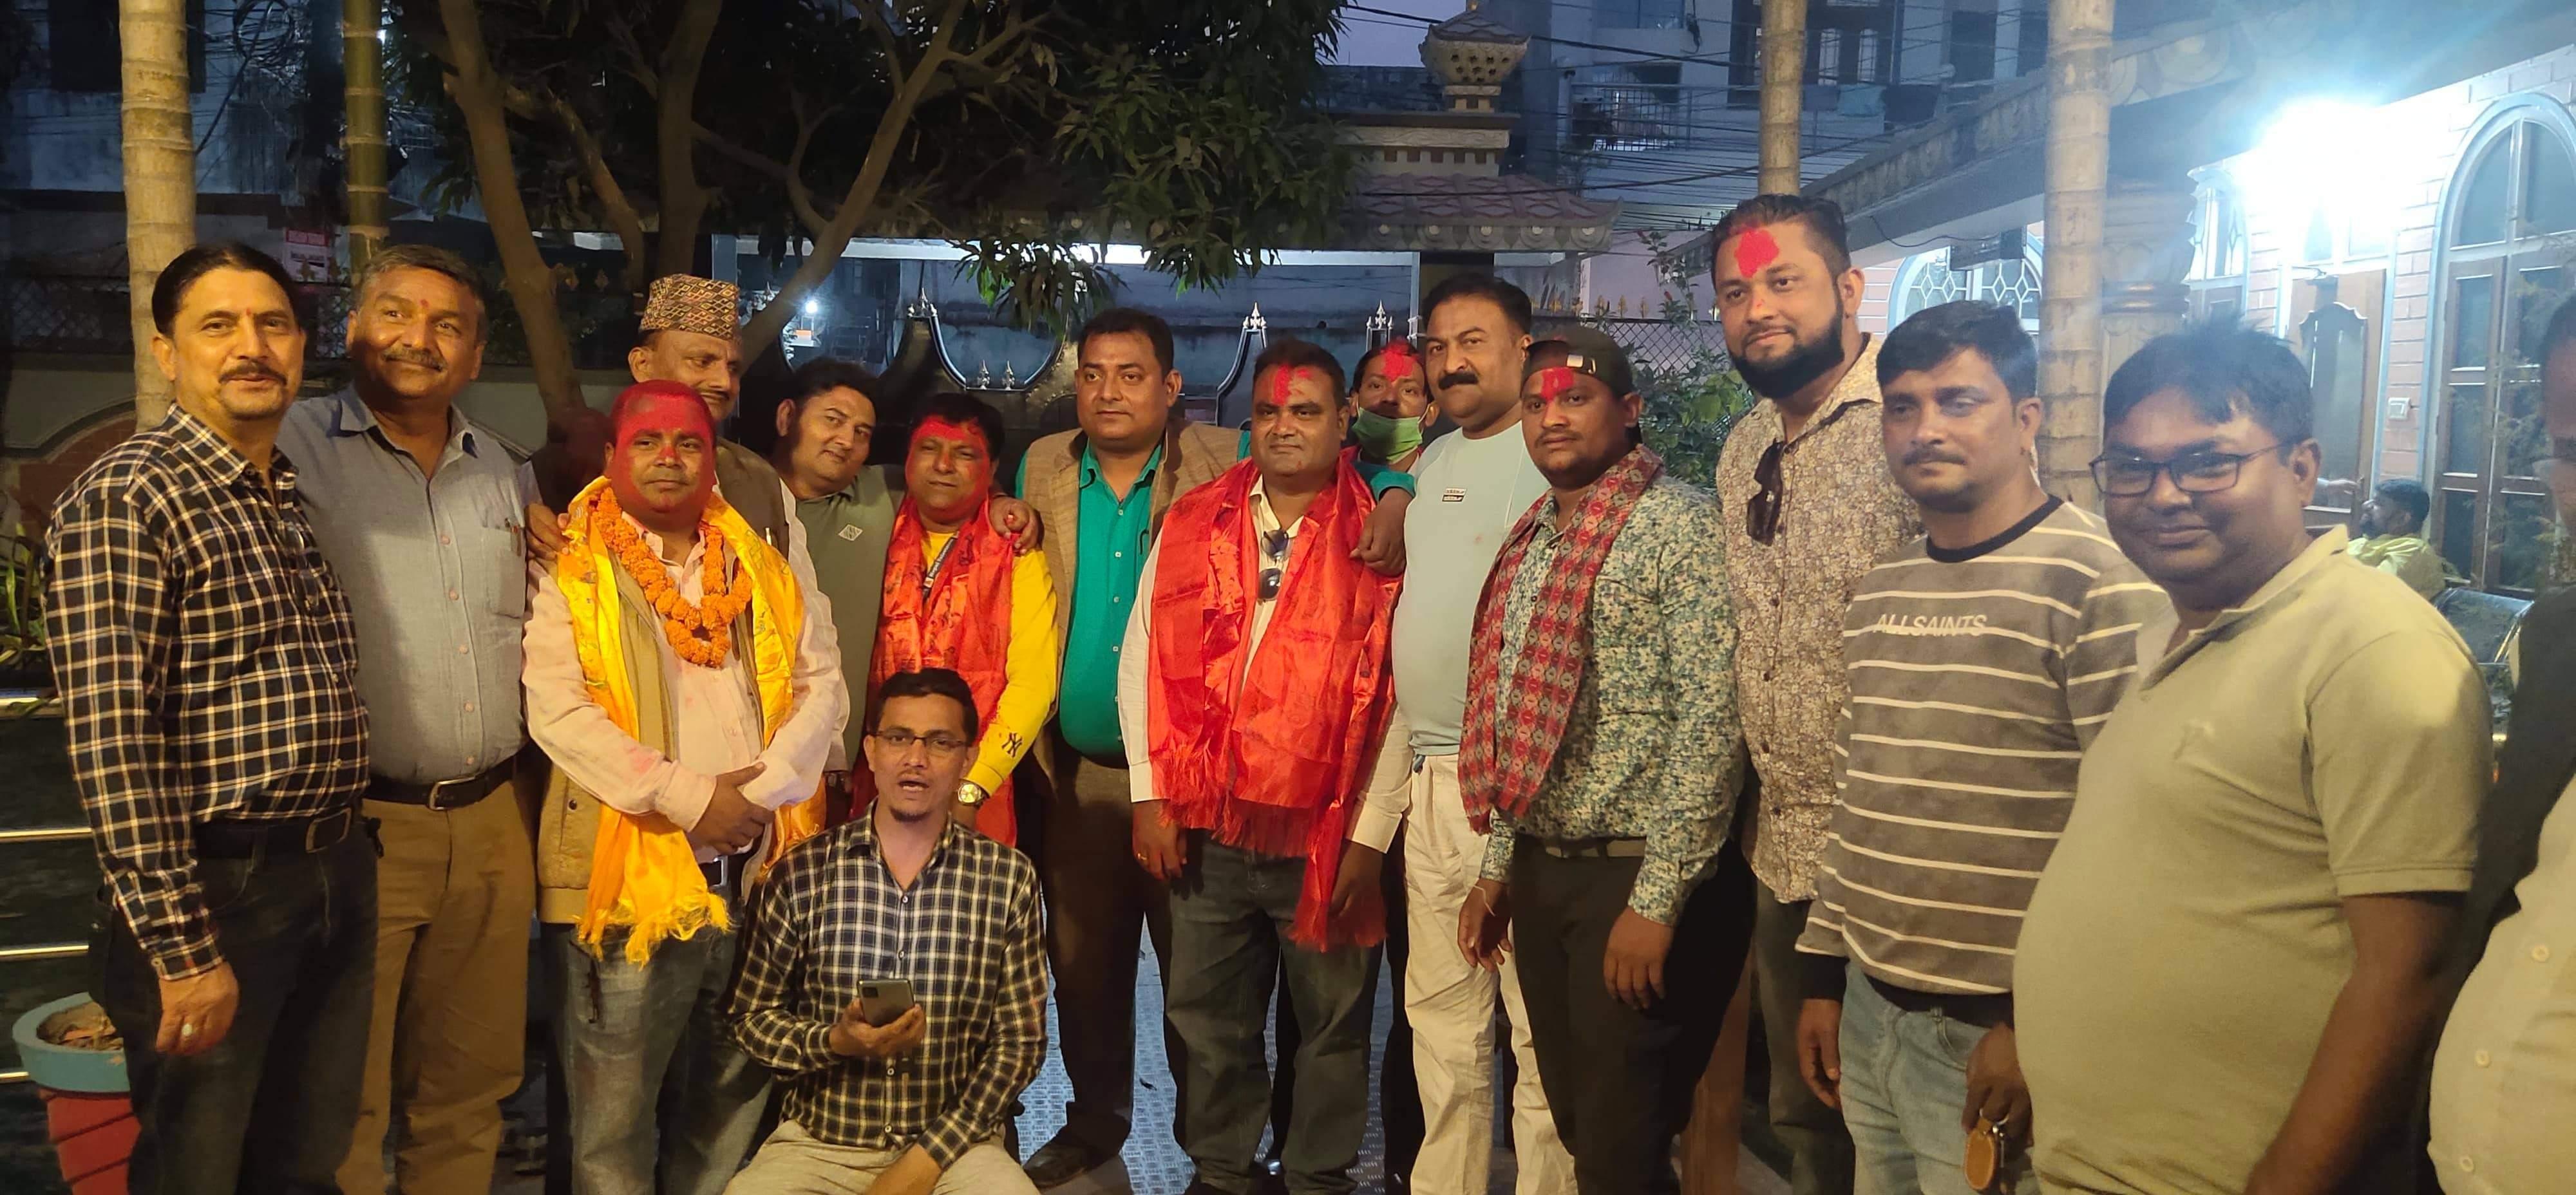 मोहम्मद सदाब सहित आधा दर्जन पत्रकार प्रेस चौतारी नेपाल पर्सामा प्रवेश।